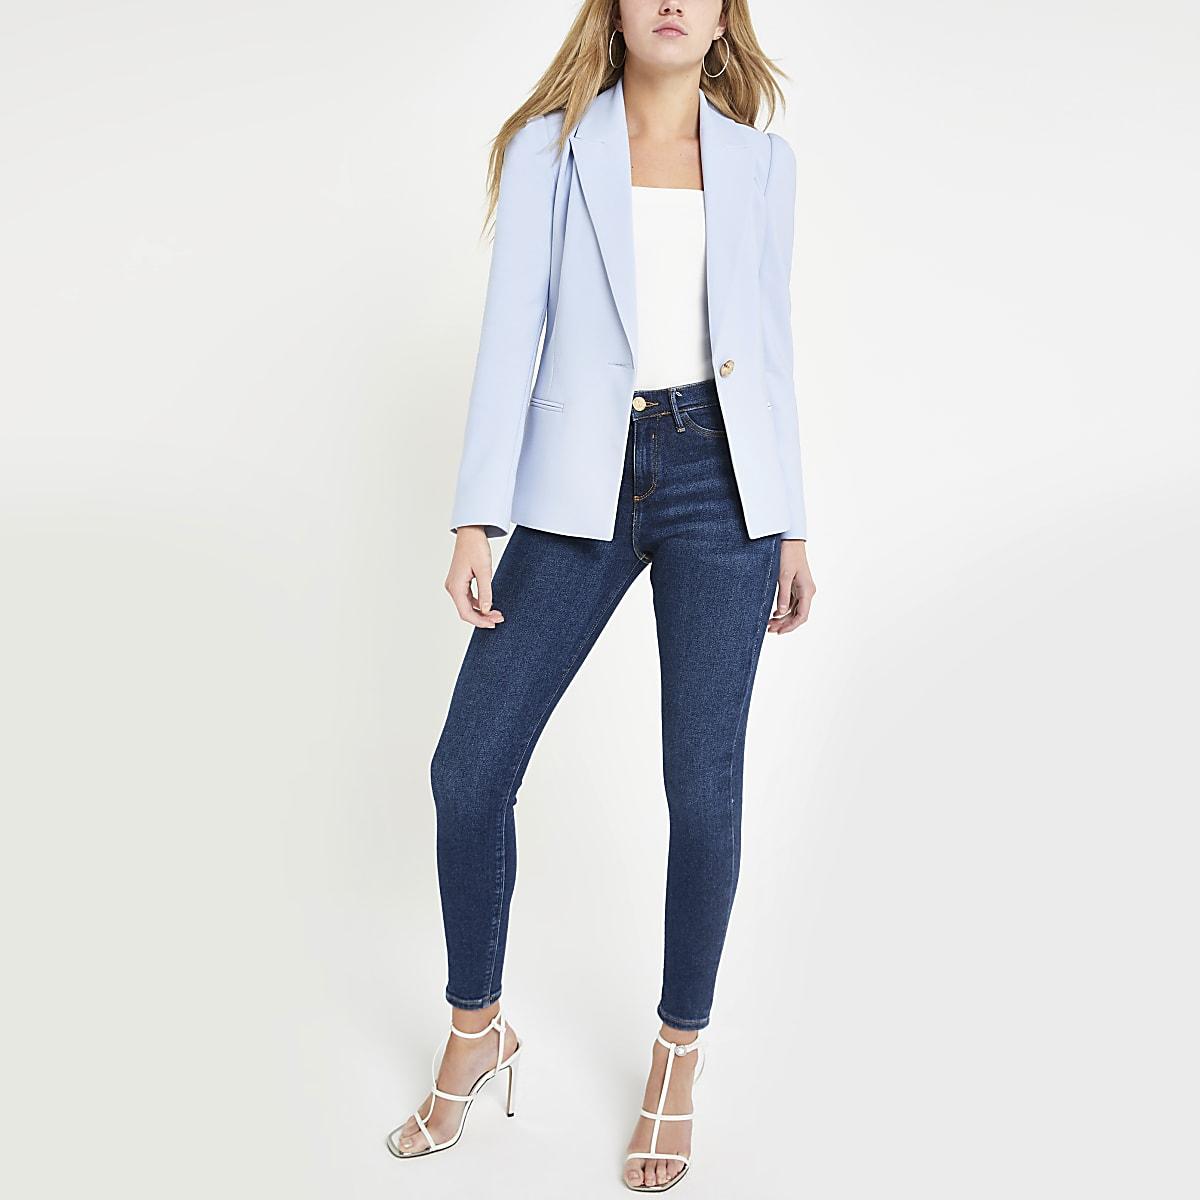 Light blue puff sleeve blazer